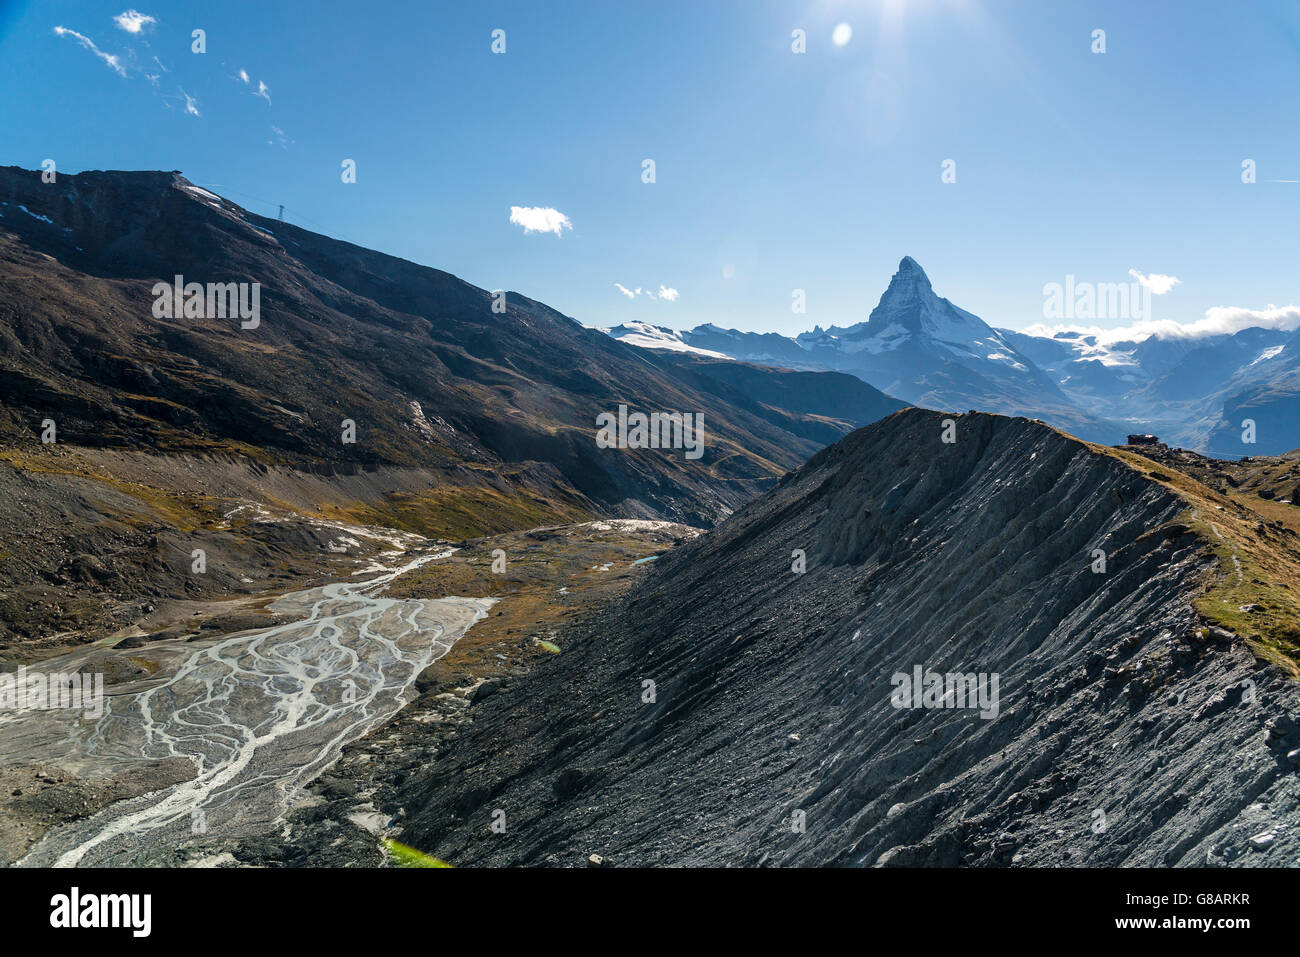 Vue sur Matterhorn, Zermatt, Suisse Banque D'Images